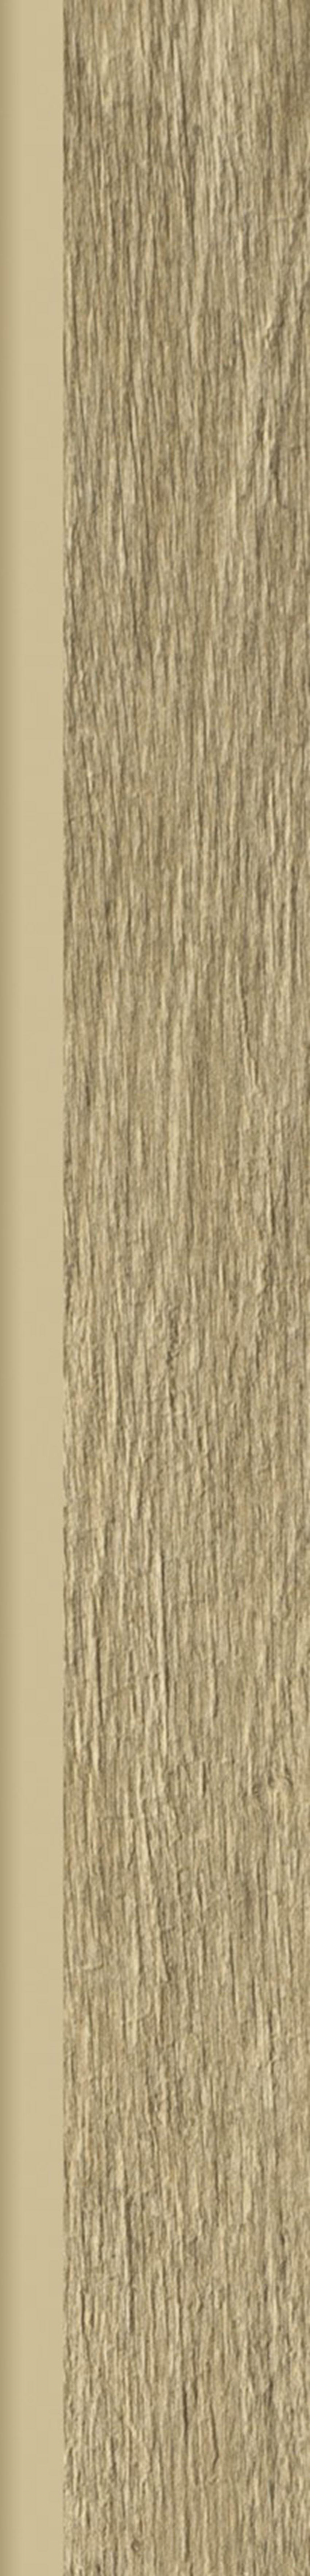 Płytka cokołowa 7,2x59,8 cm  Paradyż Almonte Natural Cokół Mat